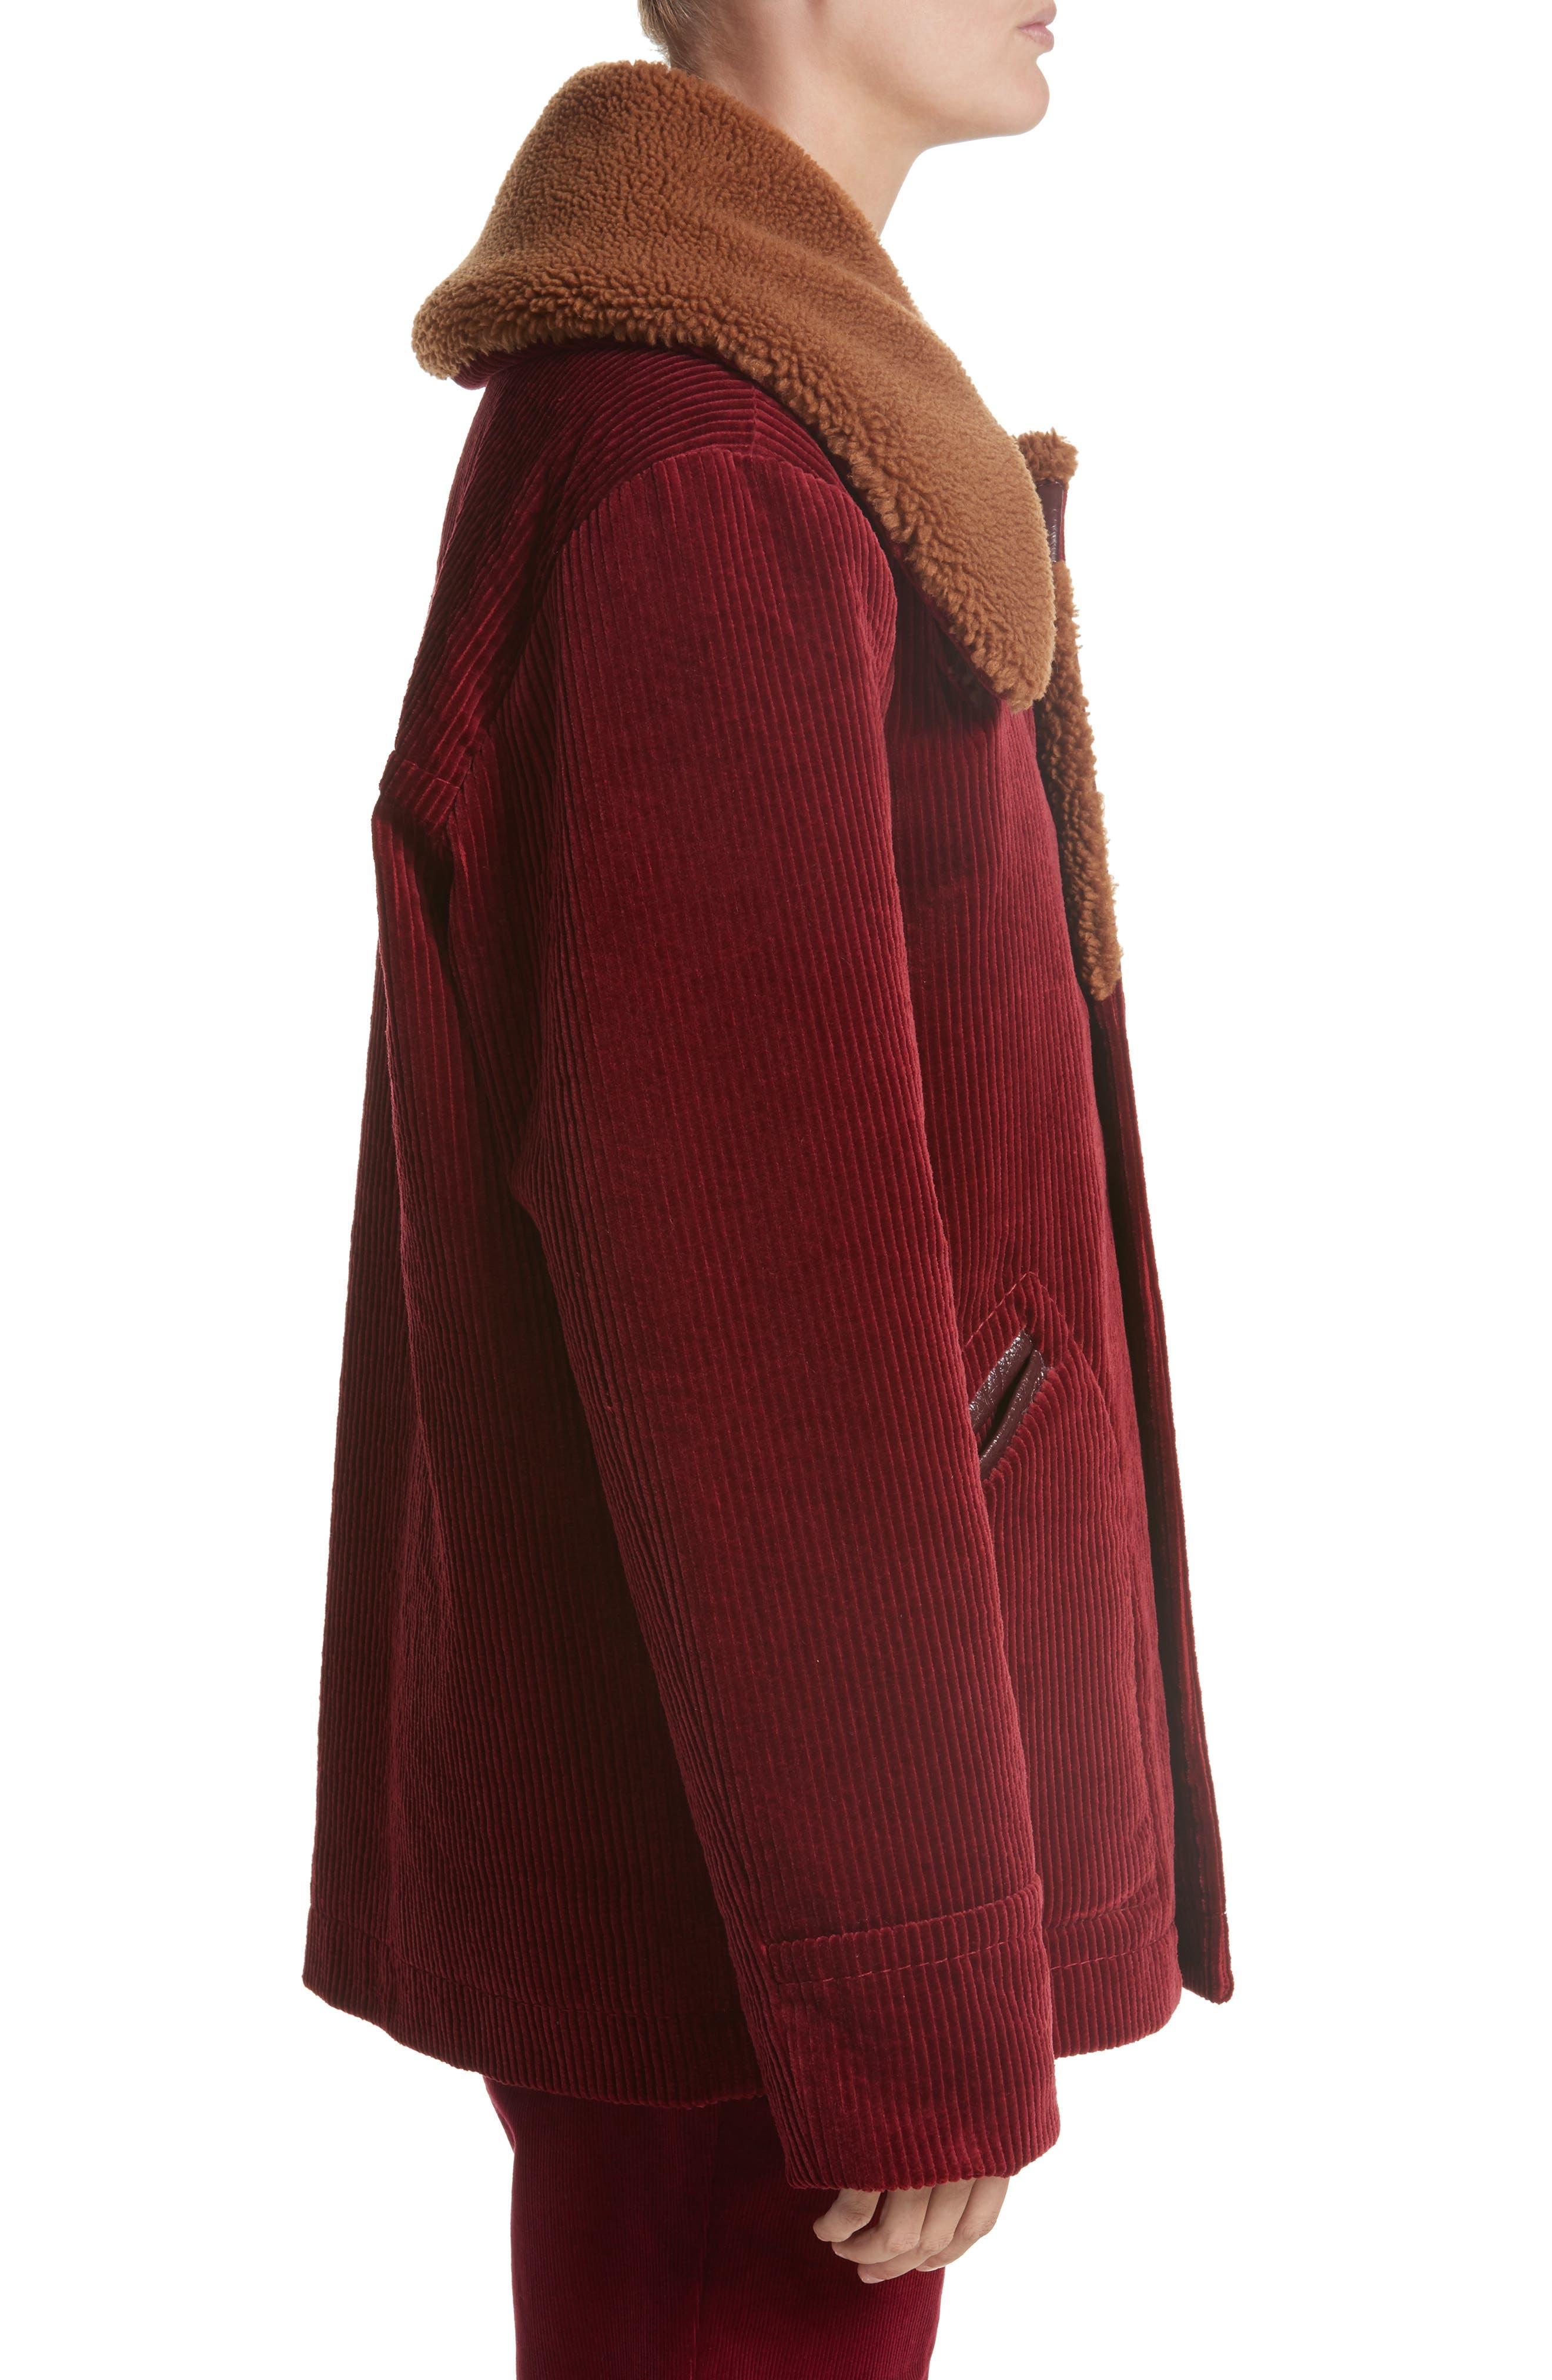 Corduroy Coat with Faux Shearling Collar,                             Alternate thumbnail 3, color,                             Bordeaux